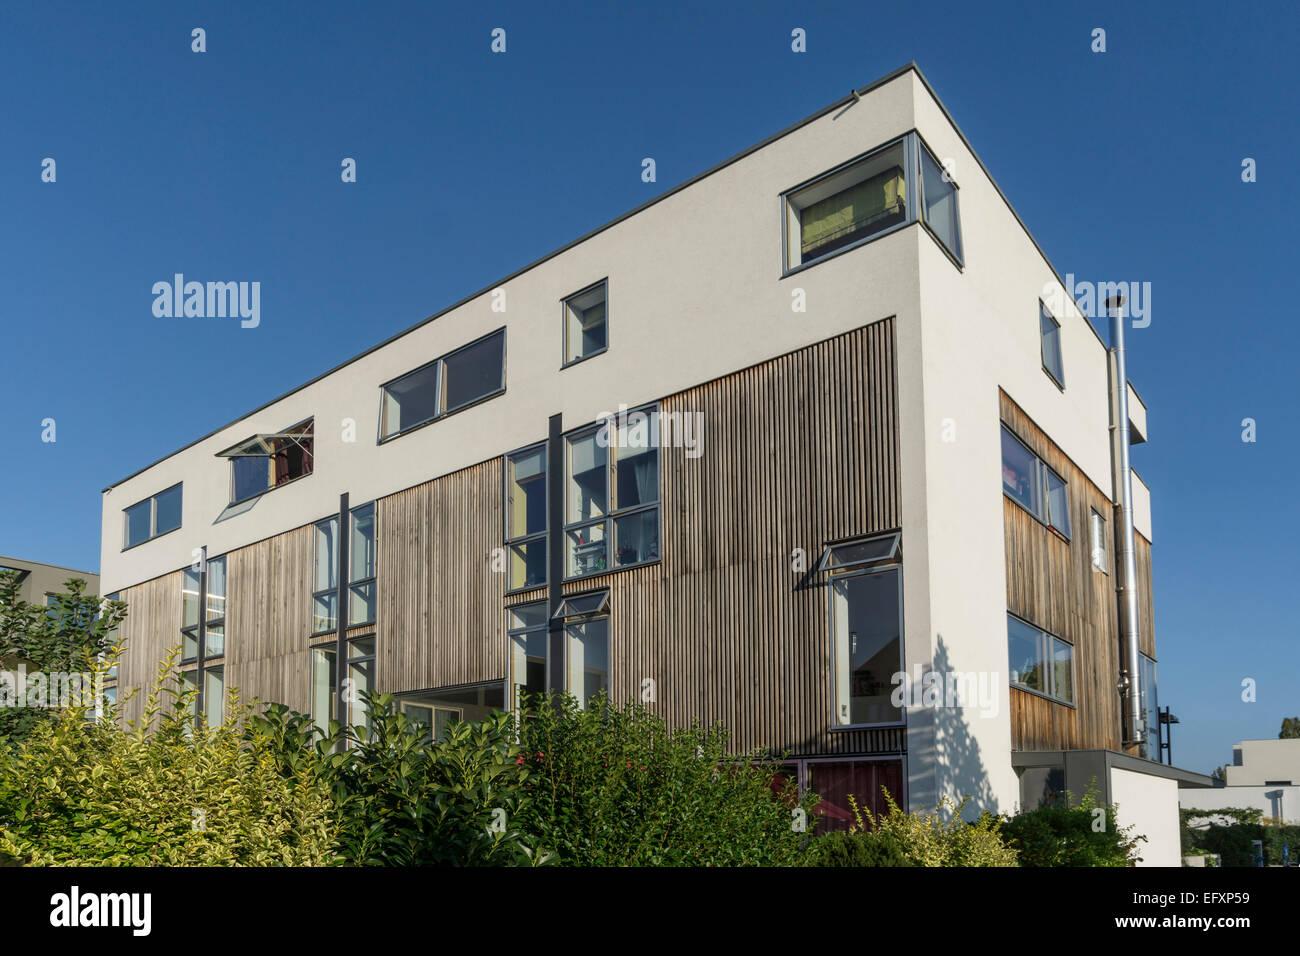 Modern Architecture, Real Estate, Rummelsburger Bucht, Berlin, Germany - Stock Image